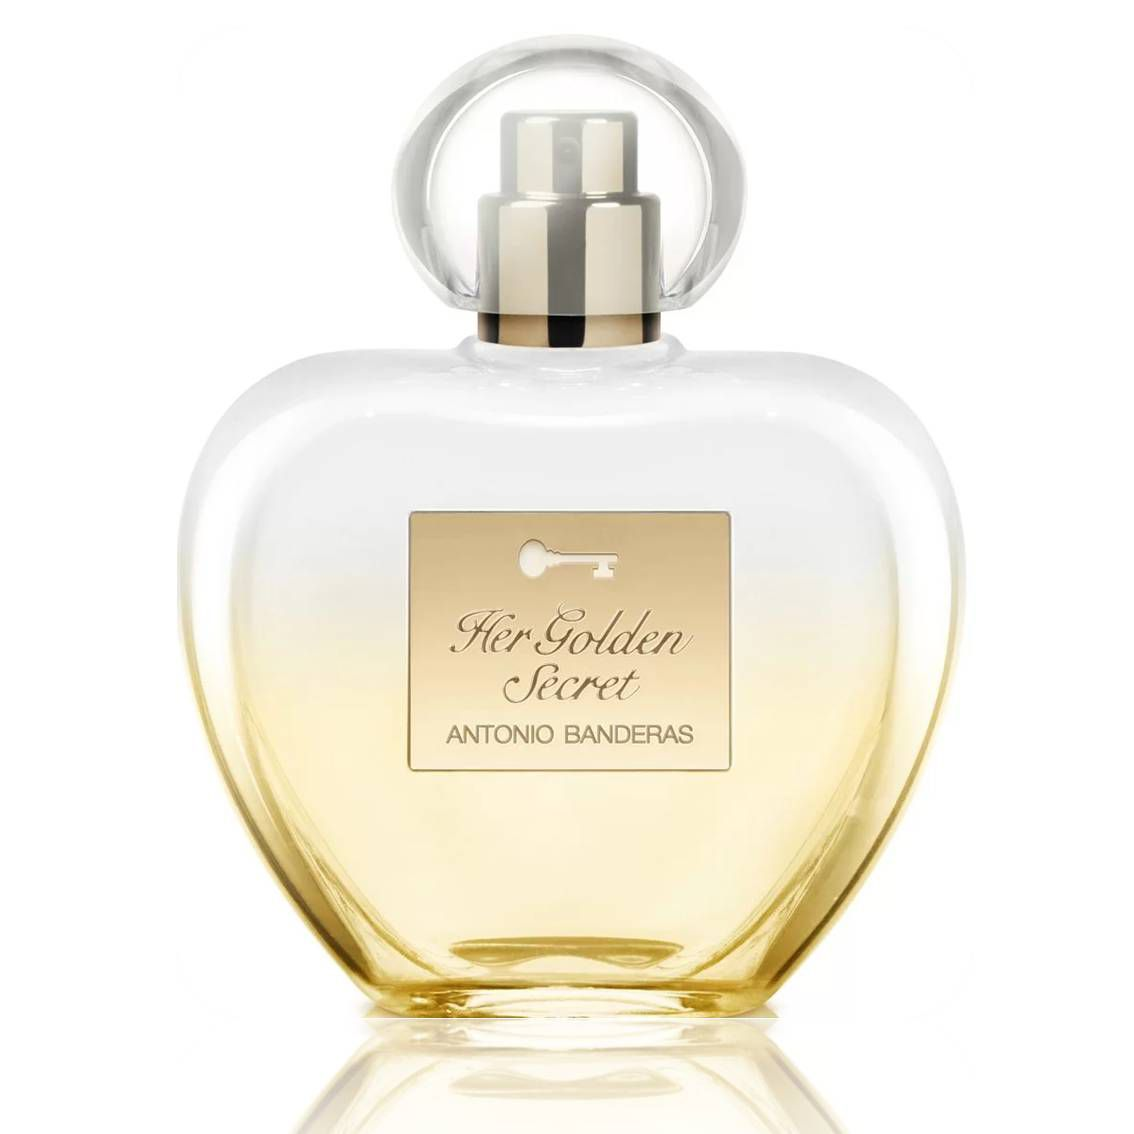 Perfume importado feminino Her Golden Secret EAU de Toilette - Antonio Bandeiras 80 ml